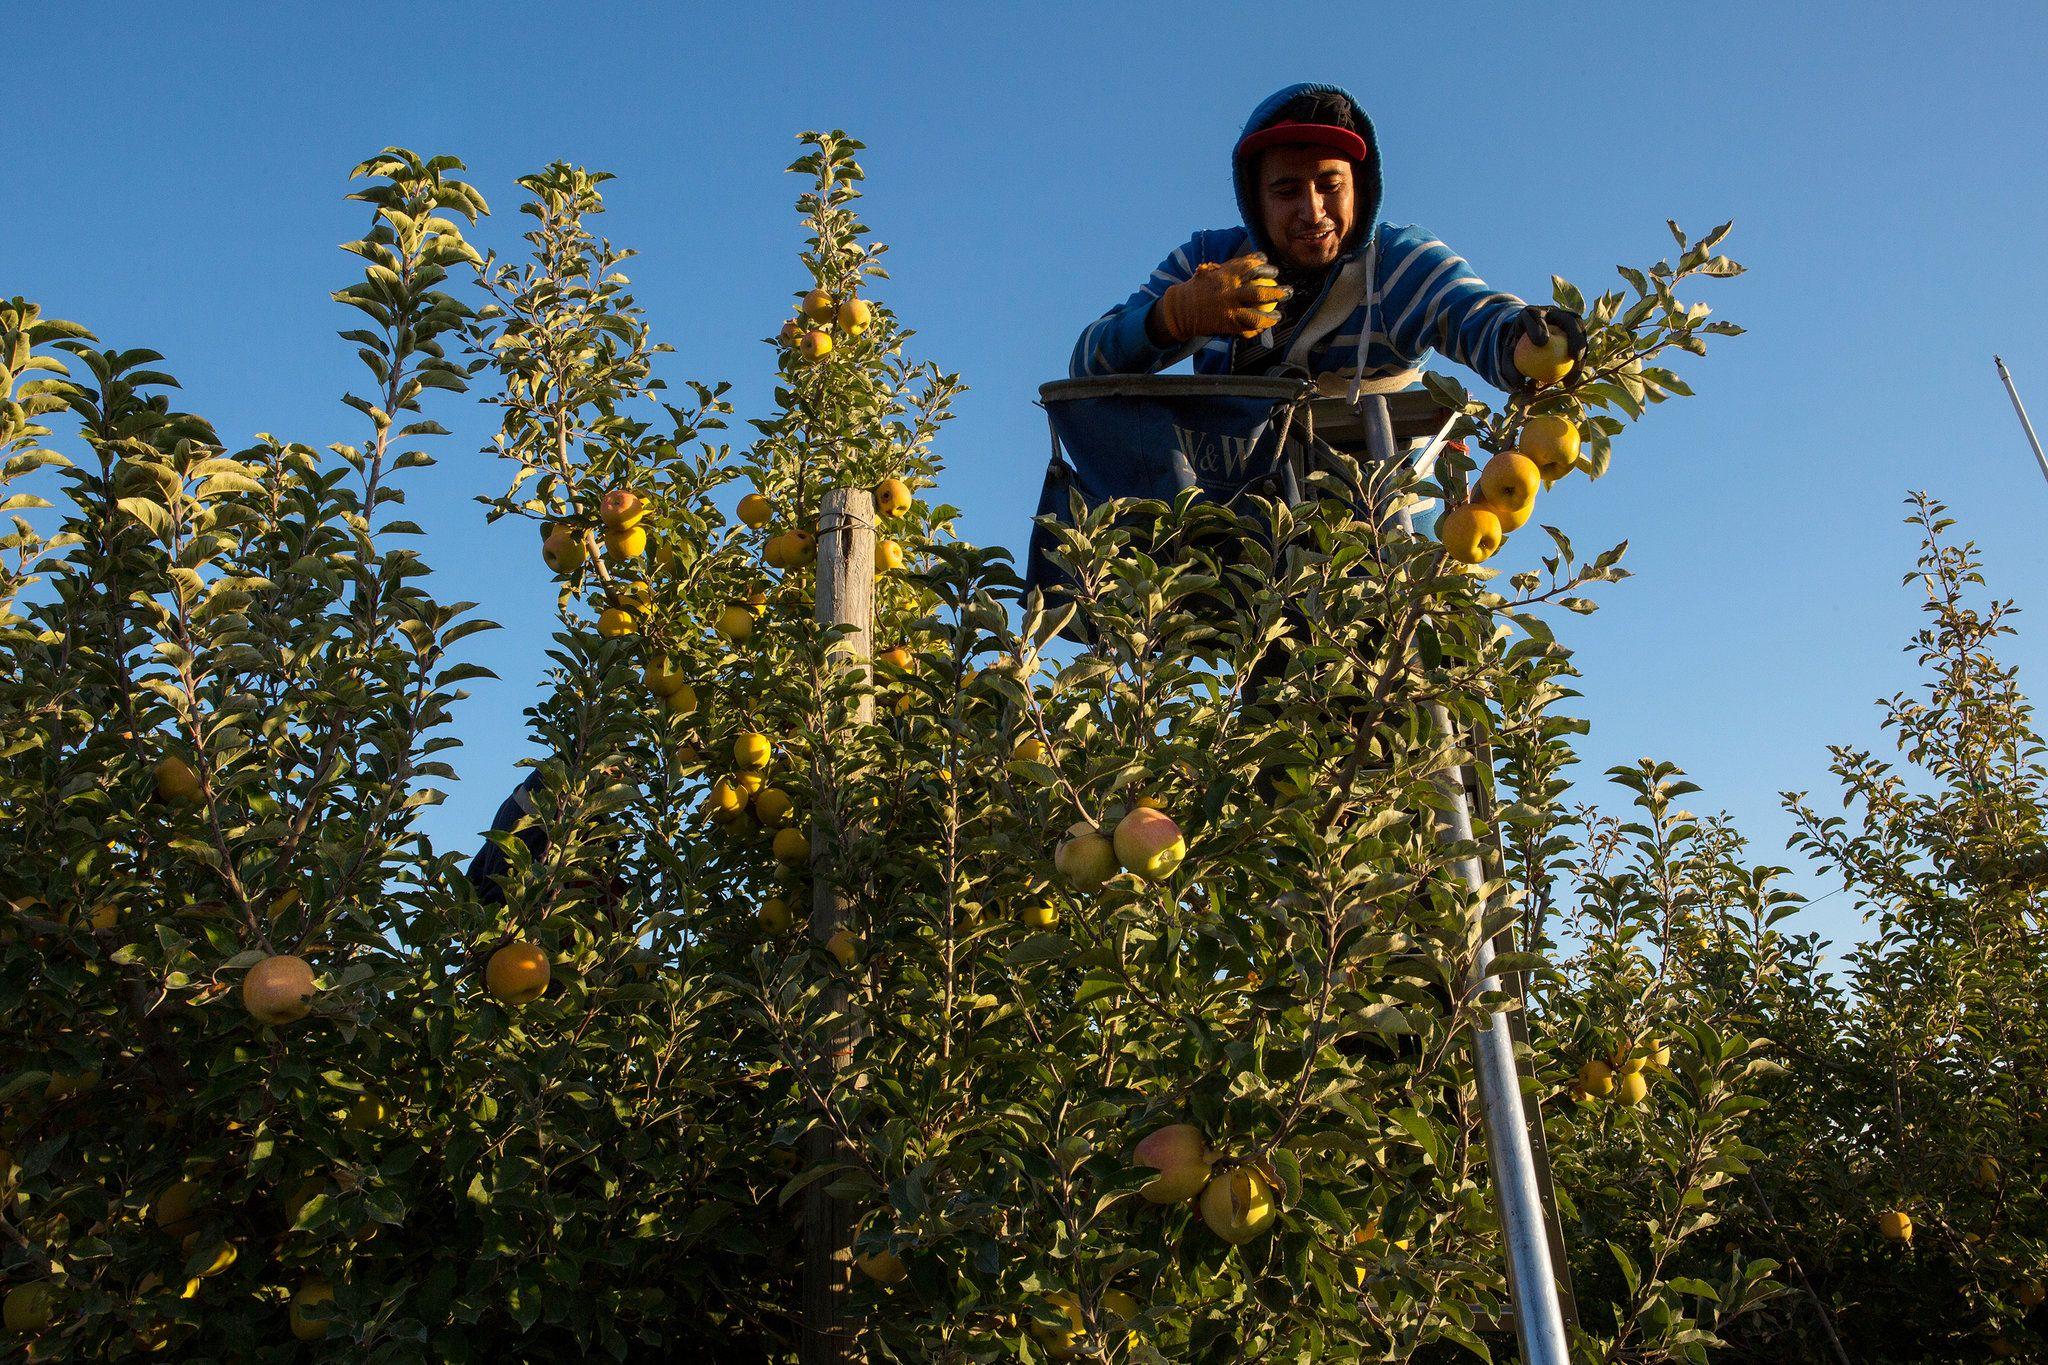 Beyond the Honeycrisp Apple Honeycrisp apples